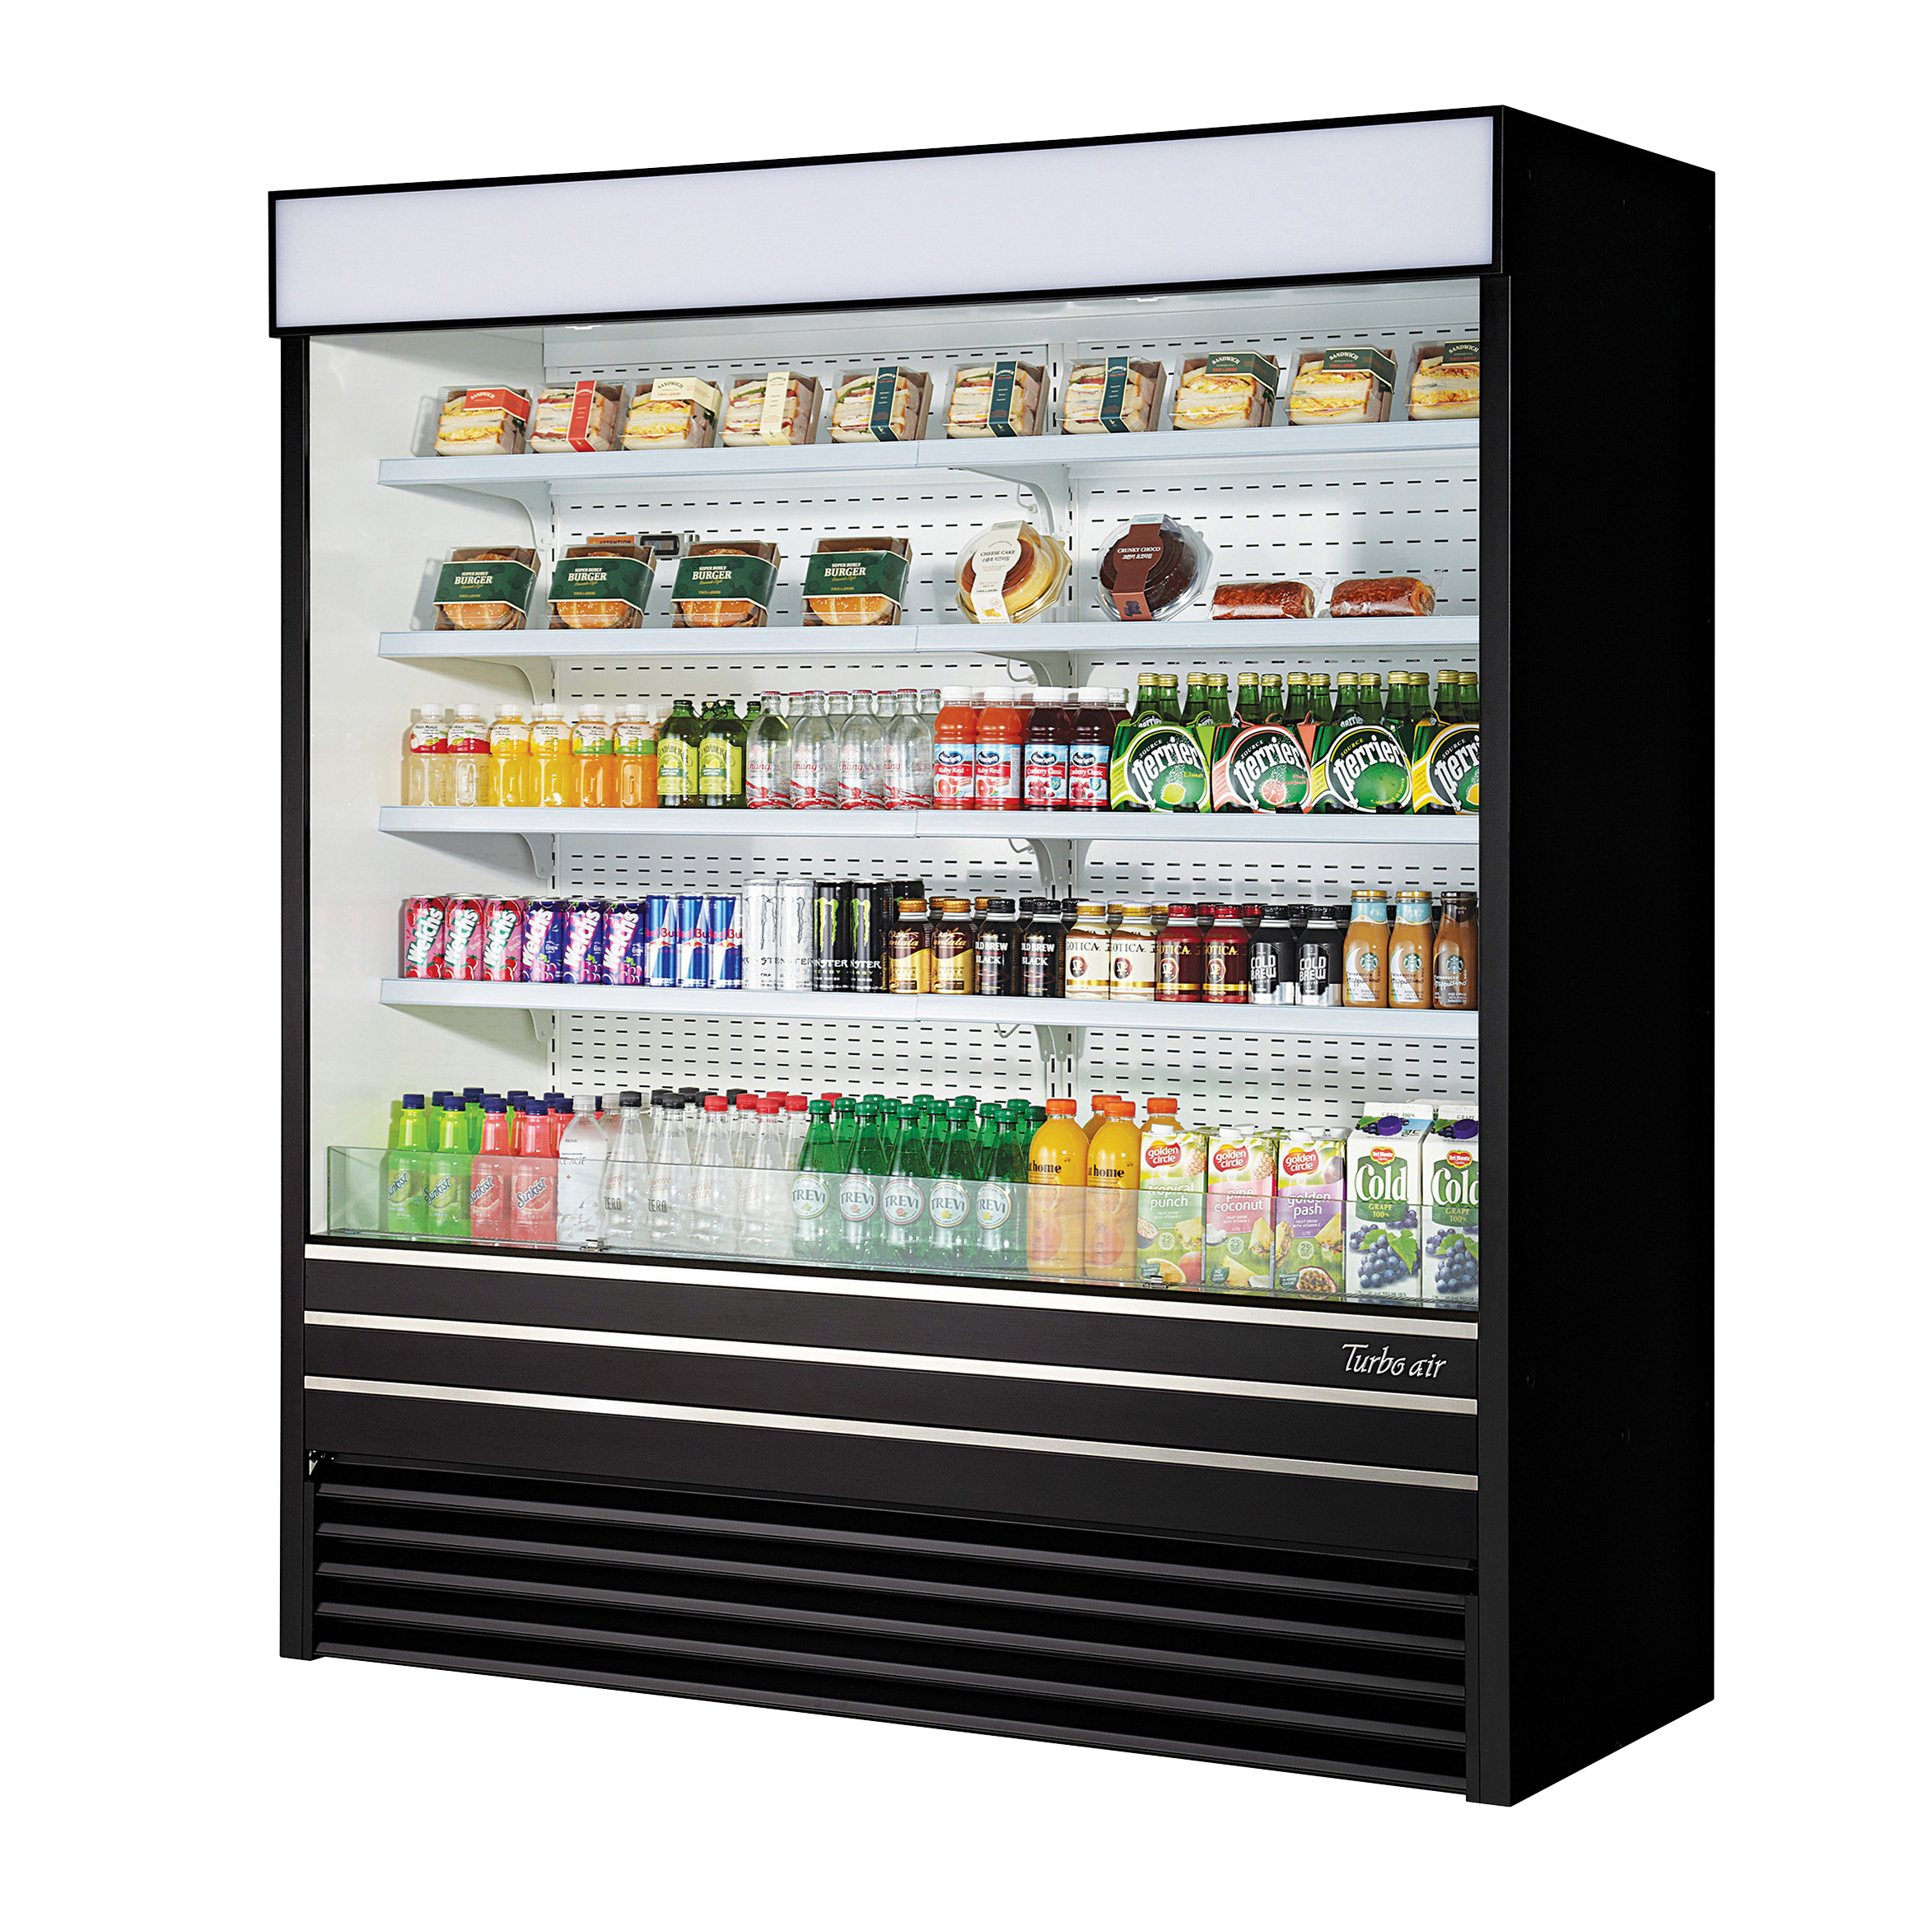 TOM-72EB-N Turbo Air merchandiser, open refrigerated display